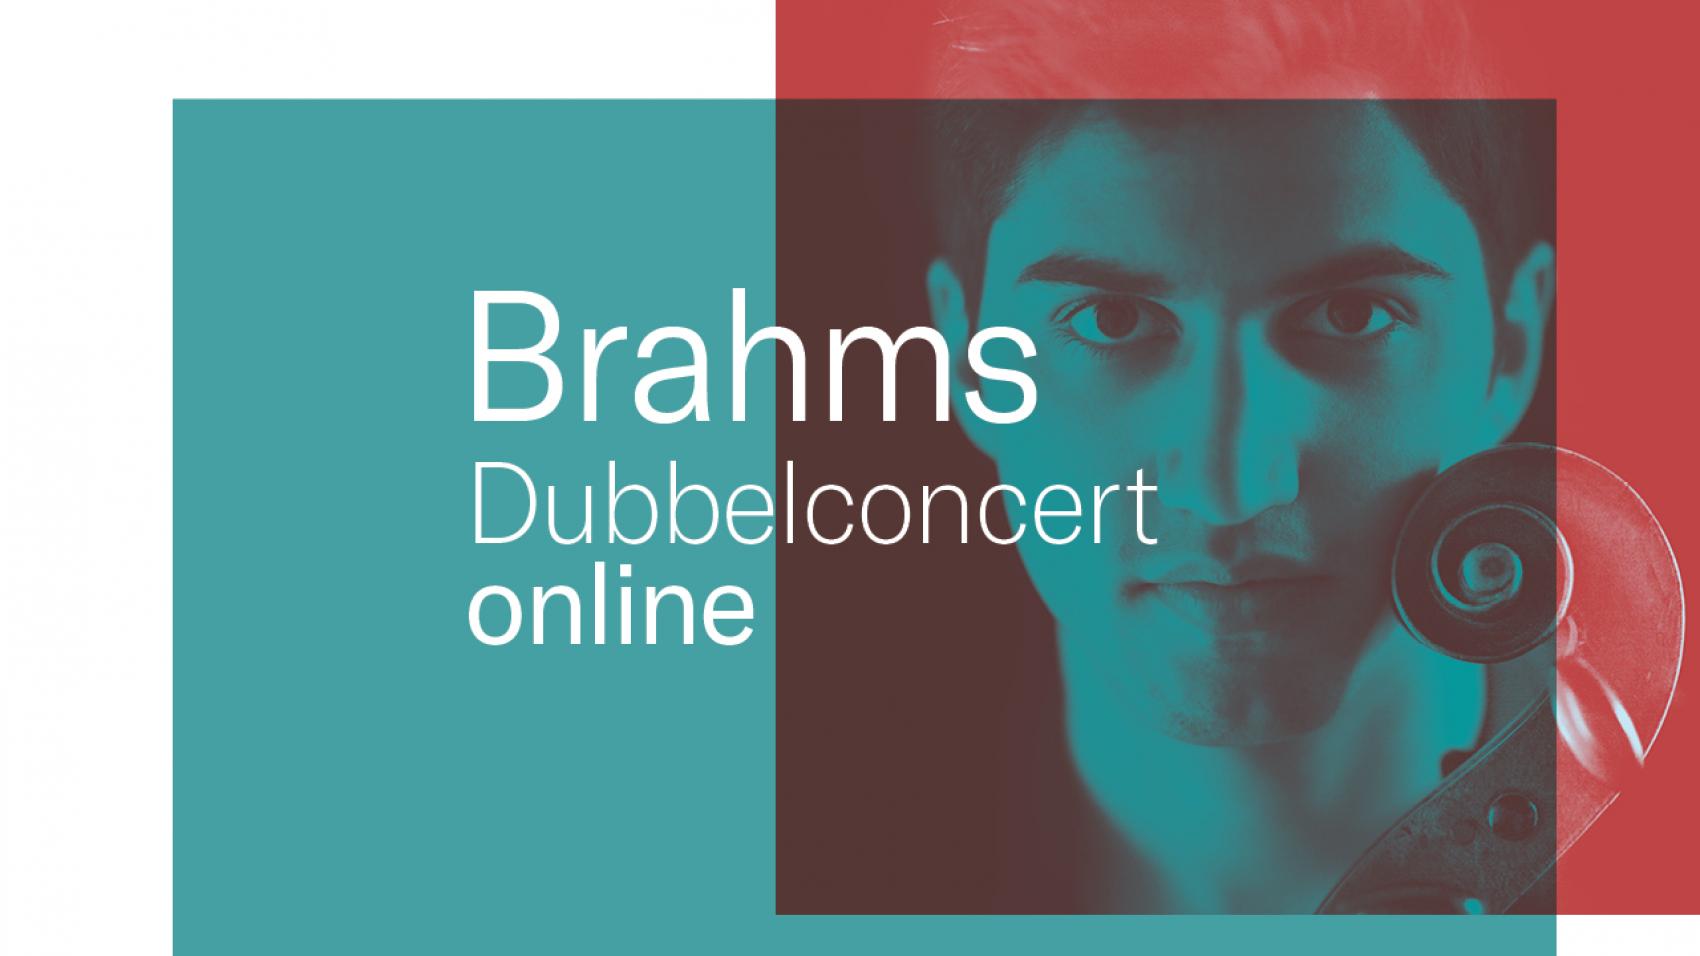 Concert stream: Tjeknavorian and Soltani in Brahms' Double Concerto